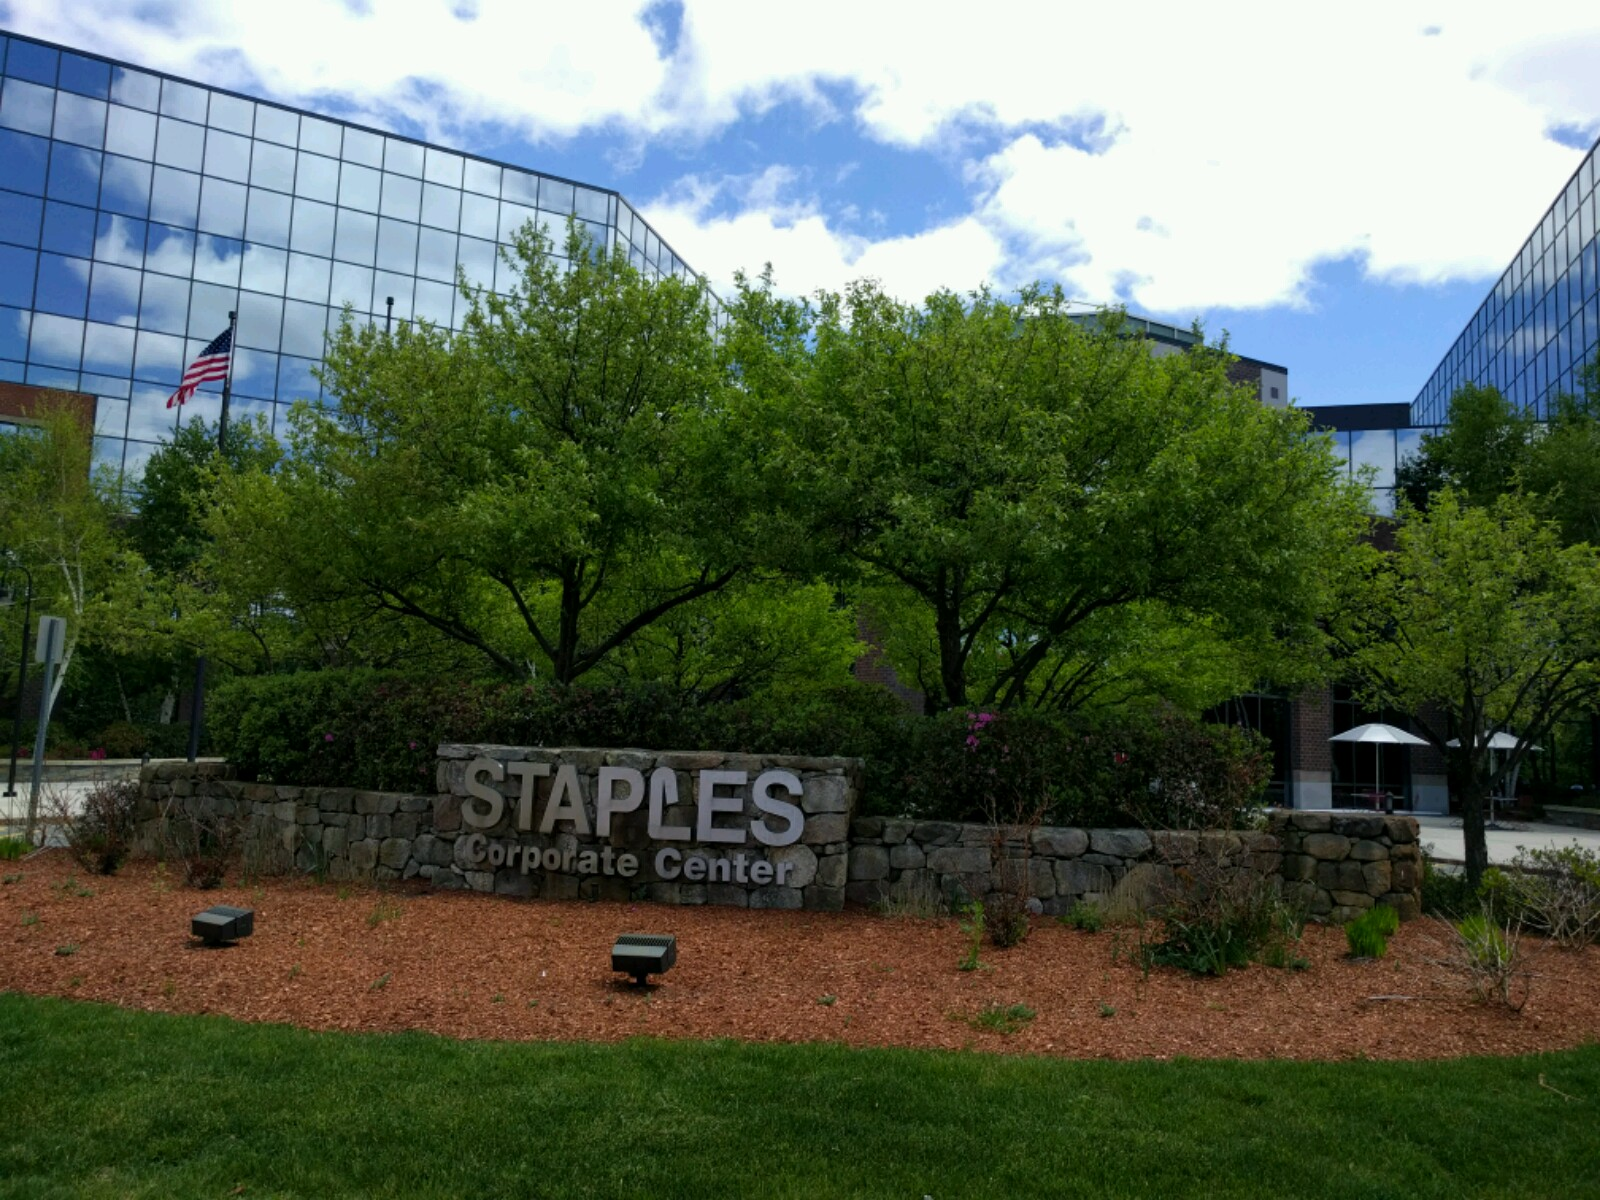 Staples' corporate headquarters in Framingham, Massachusetts.